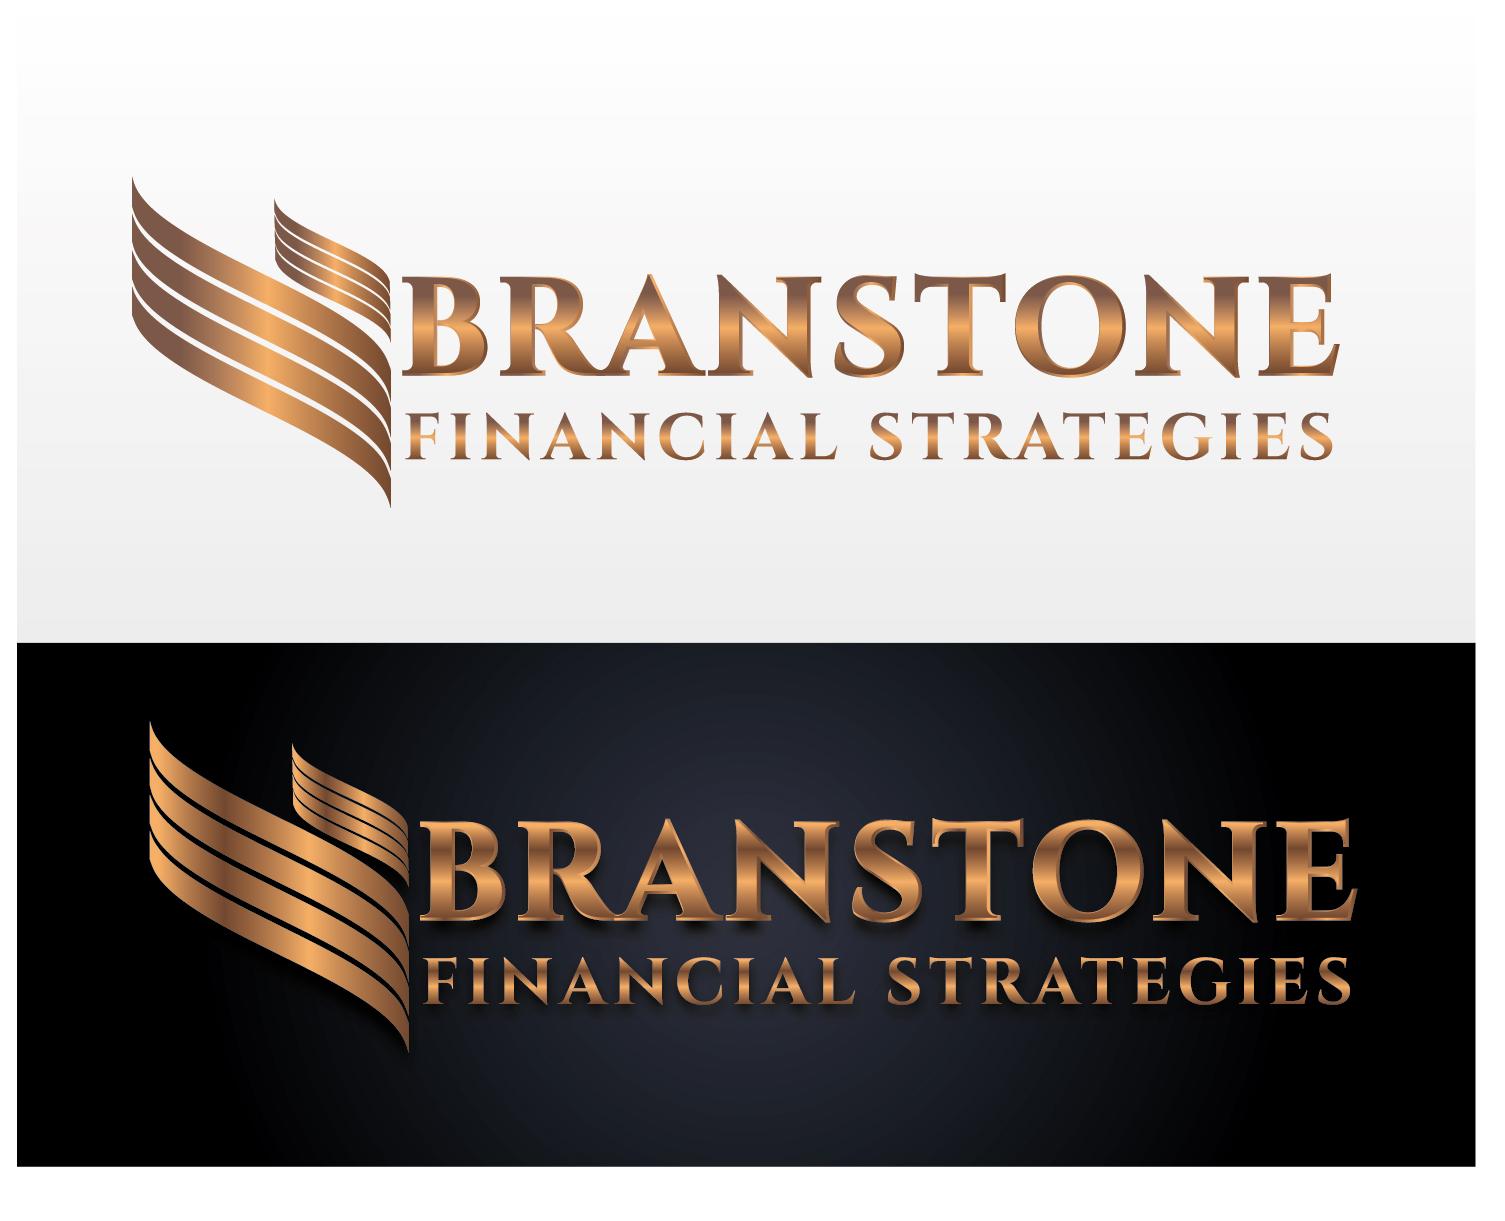 Logo Design by VENTSISLAV KOVACHEV - Entry No. 81 in the Logo Design Contest Inspiring Logo Design for Branstone Financial Strategies.